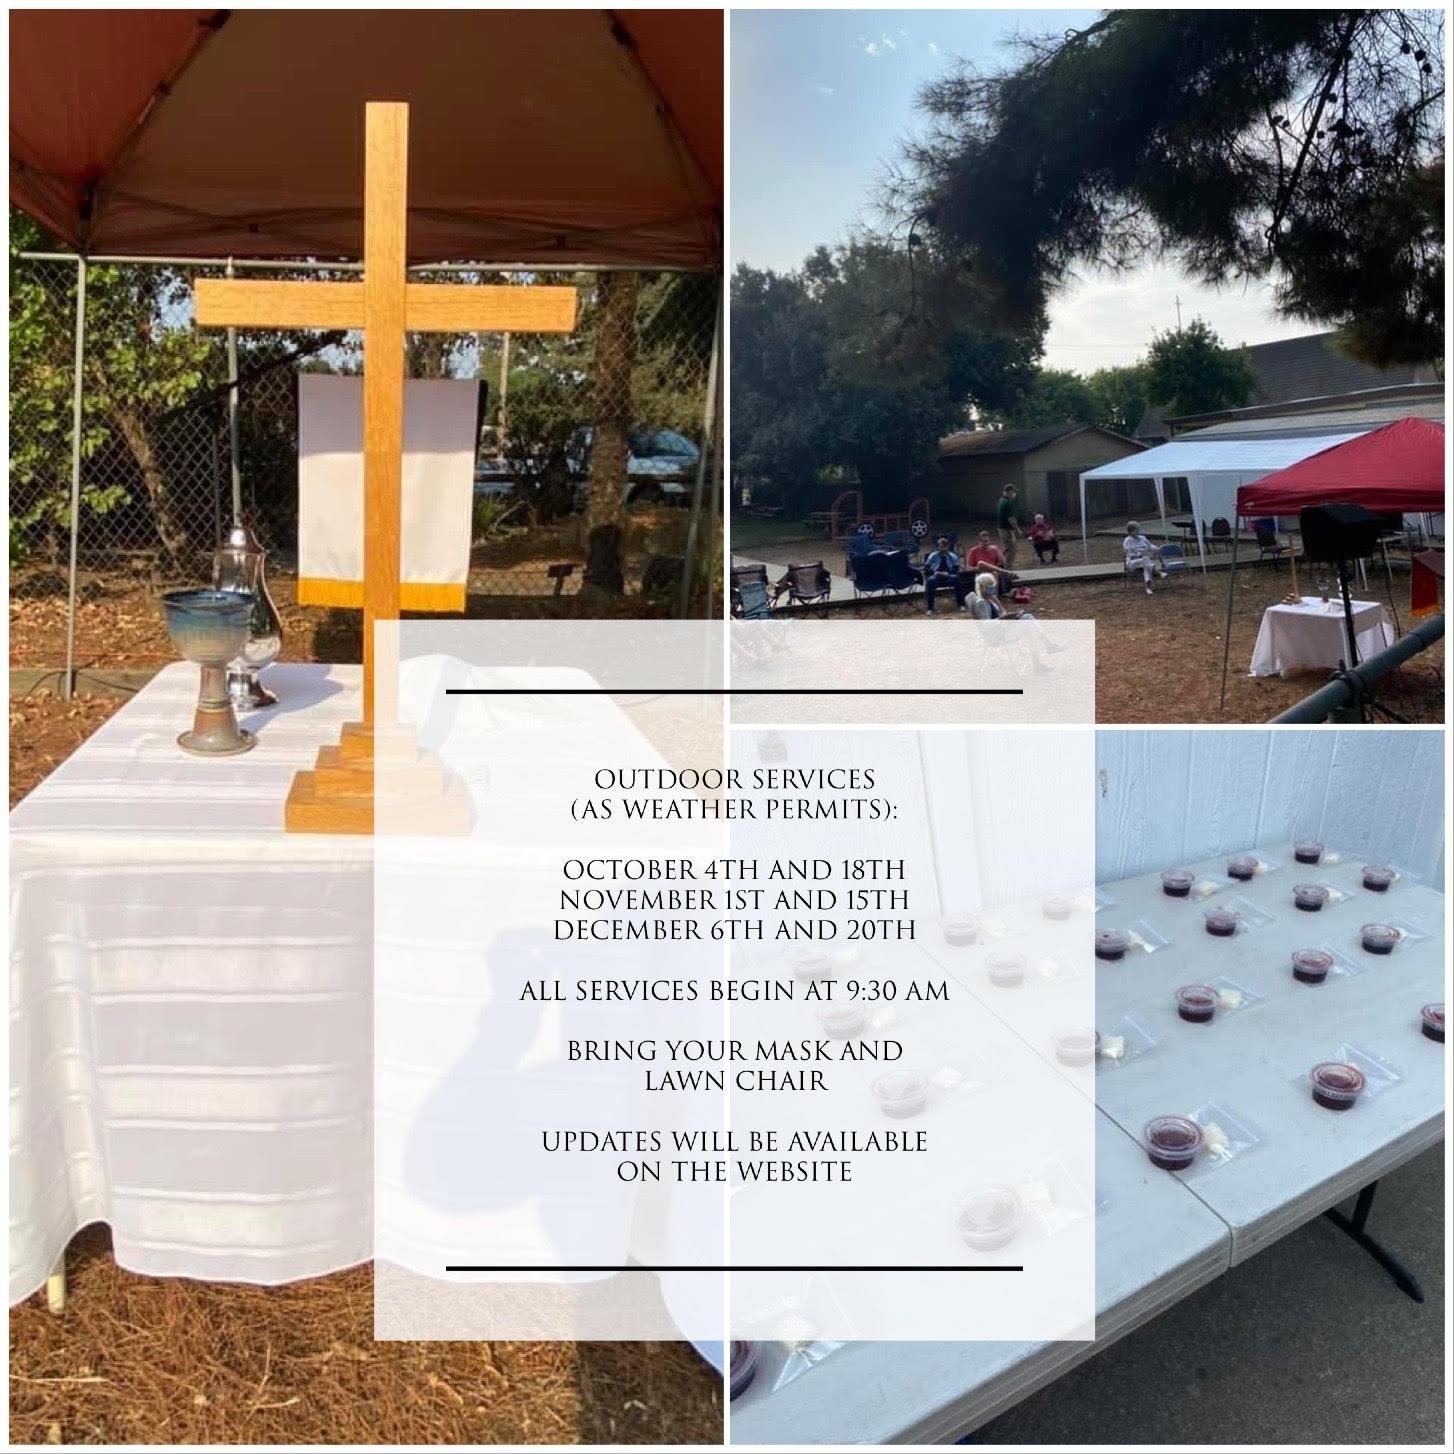 Geneva Presbyterian Church Outdoor Services Information for Covid-19